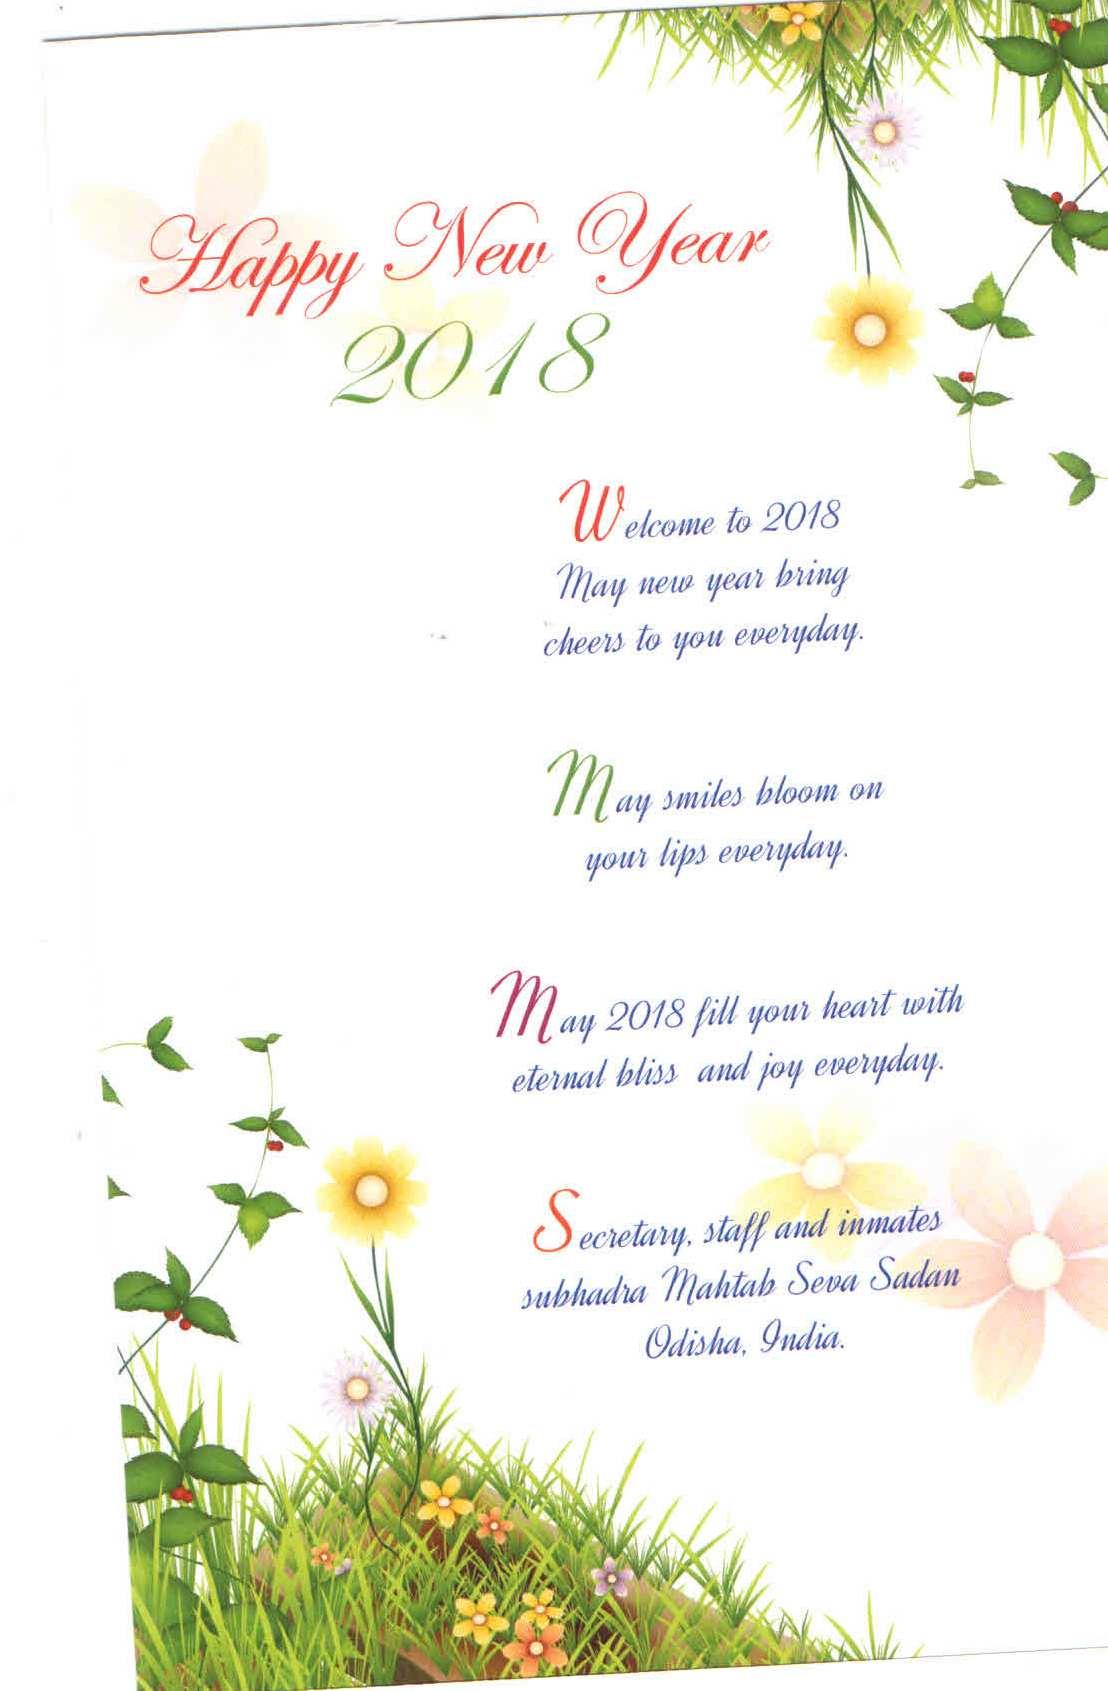 Greetings from SMSS. Feliz 2018